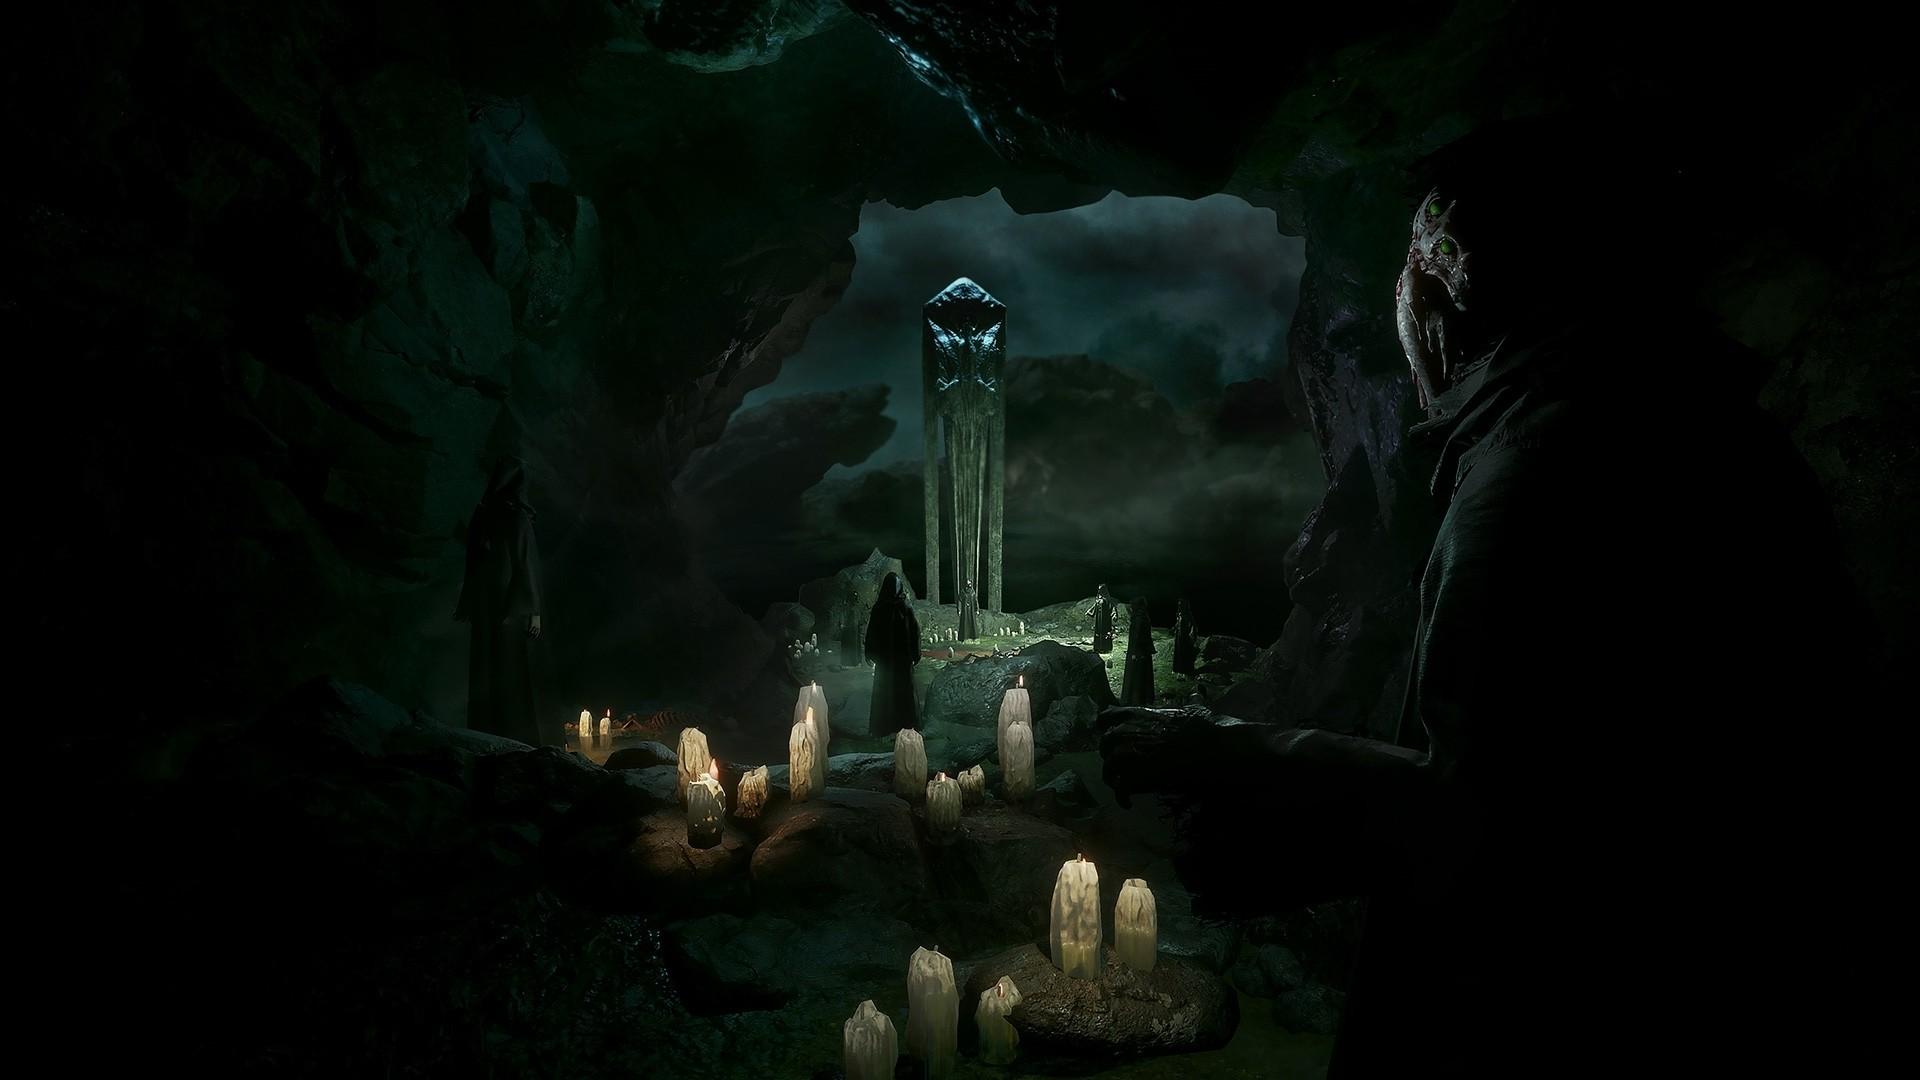 Lovecraft Wallpaper Pic